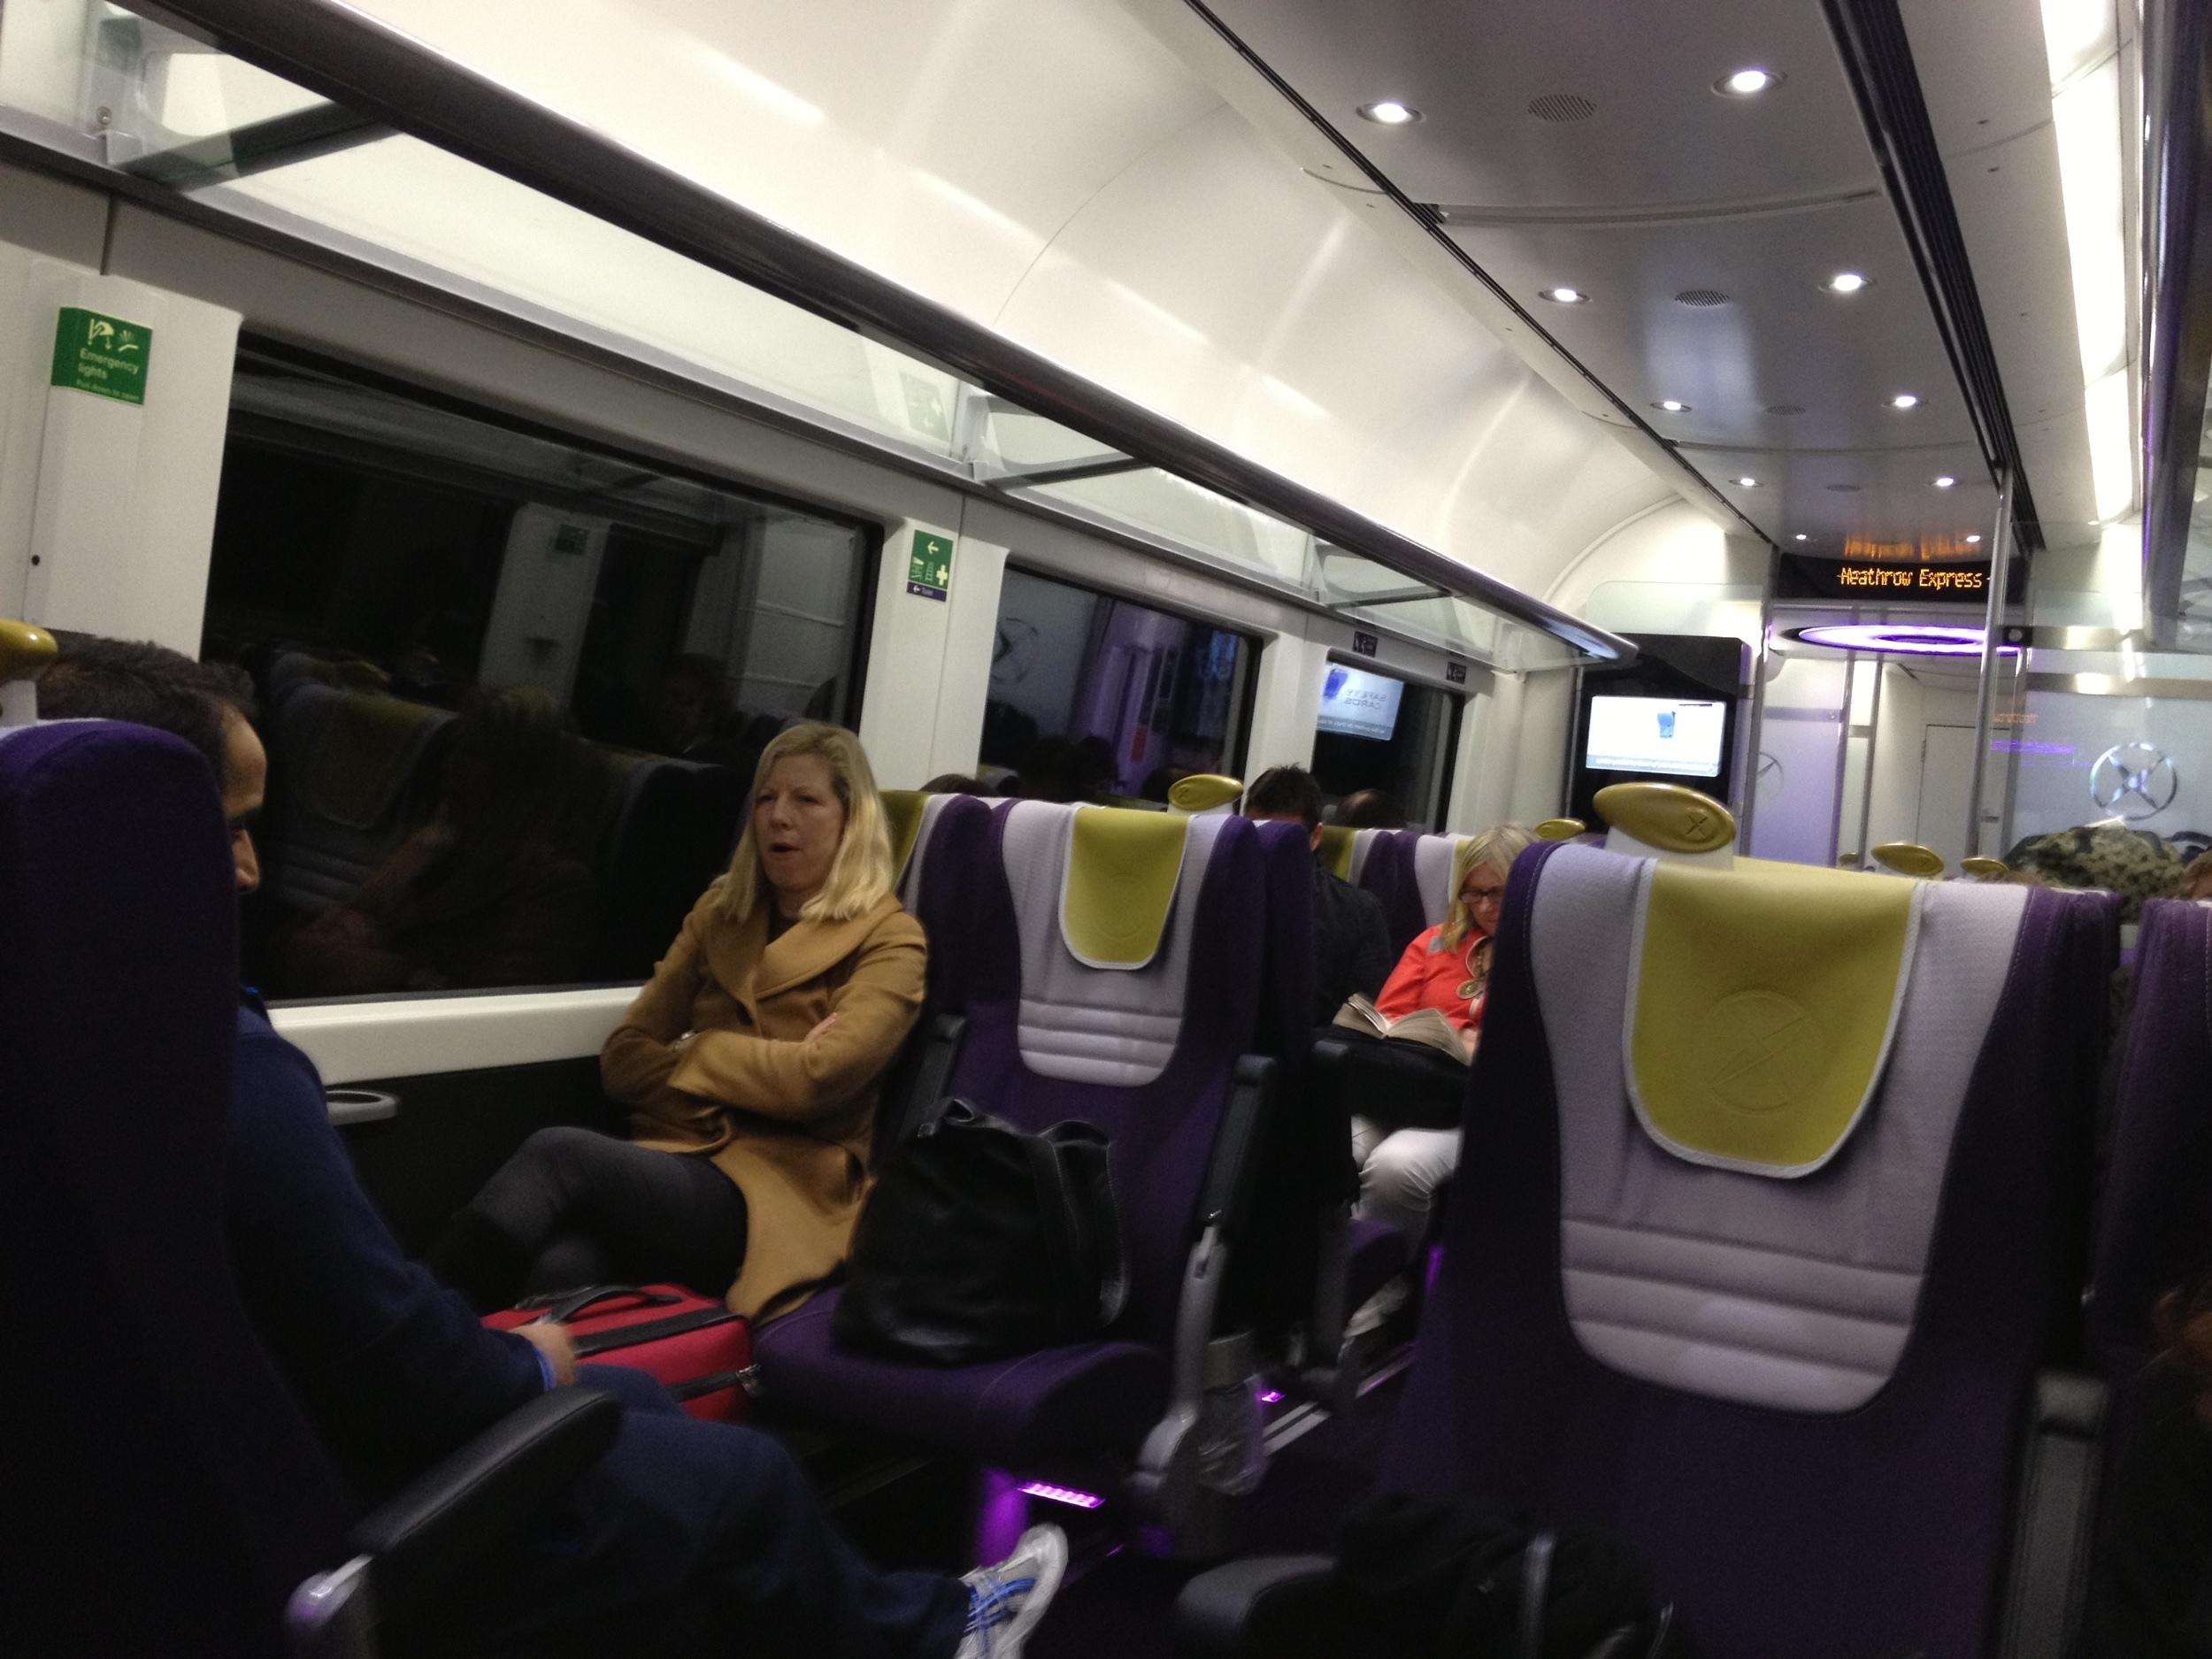 The Heathrow Express